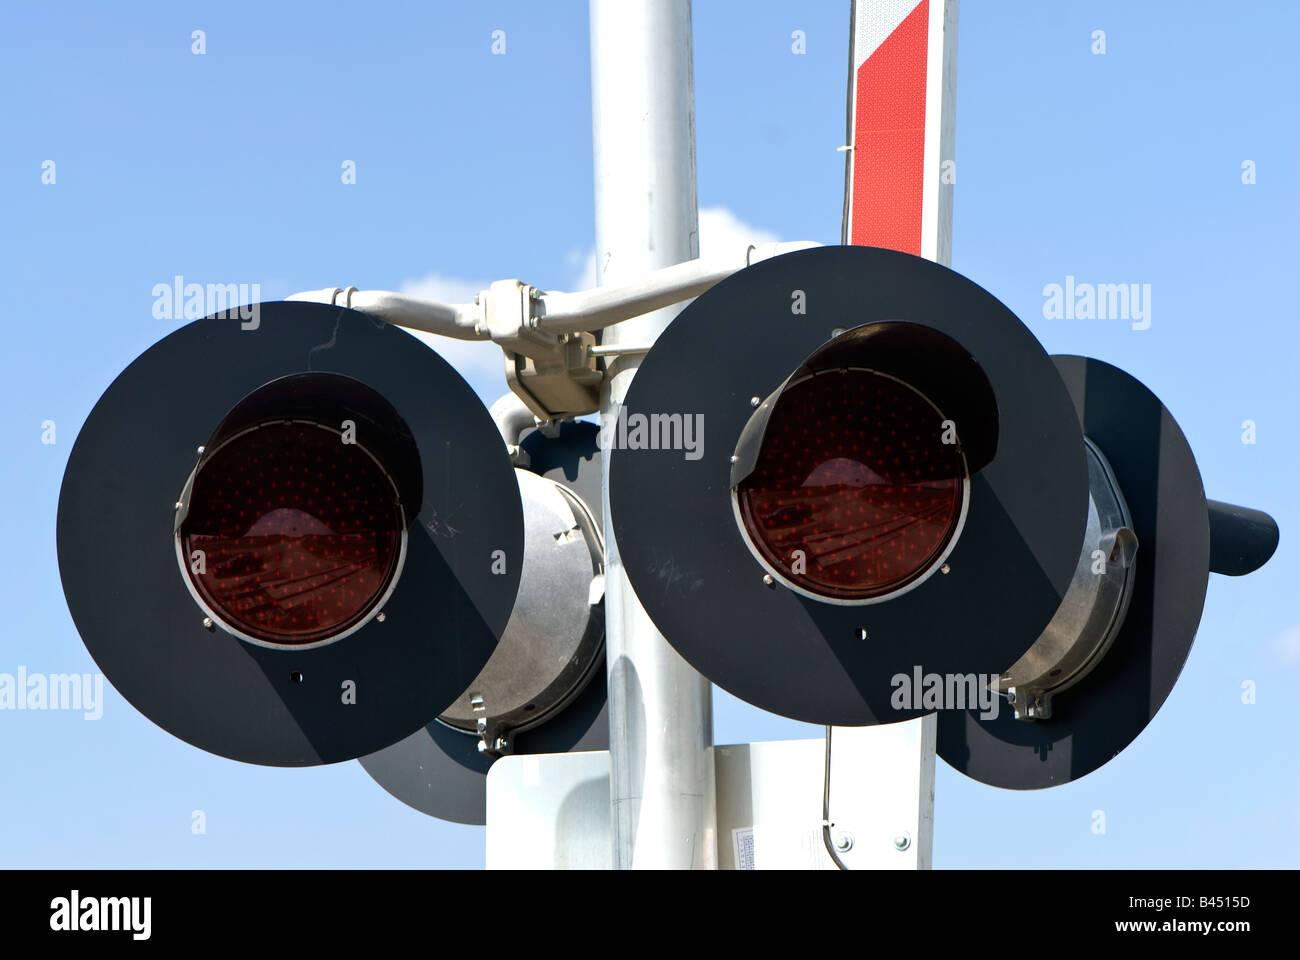 Train Crossing lights on the railroad Stock Photo: 19779689